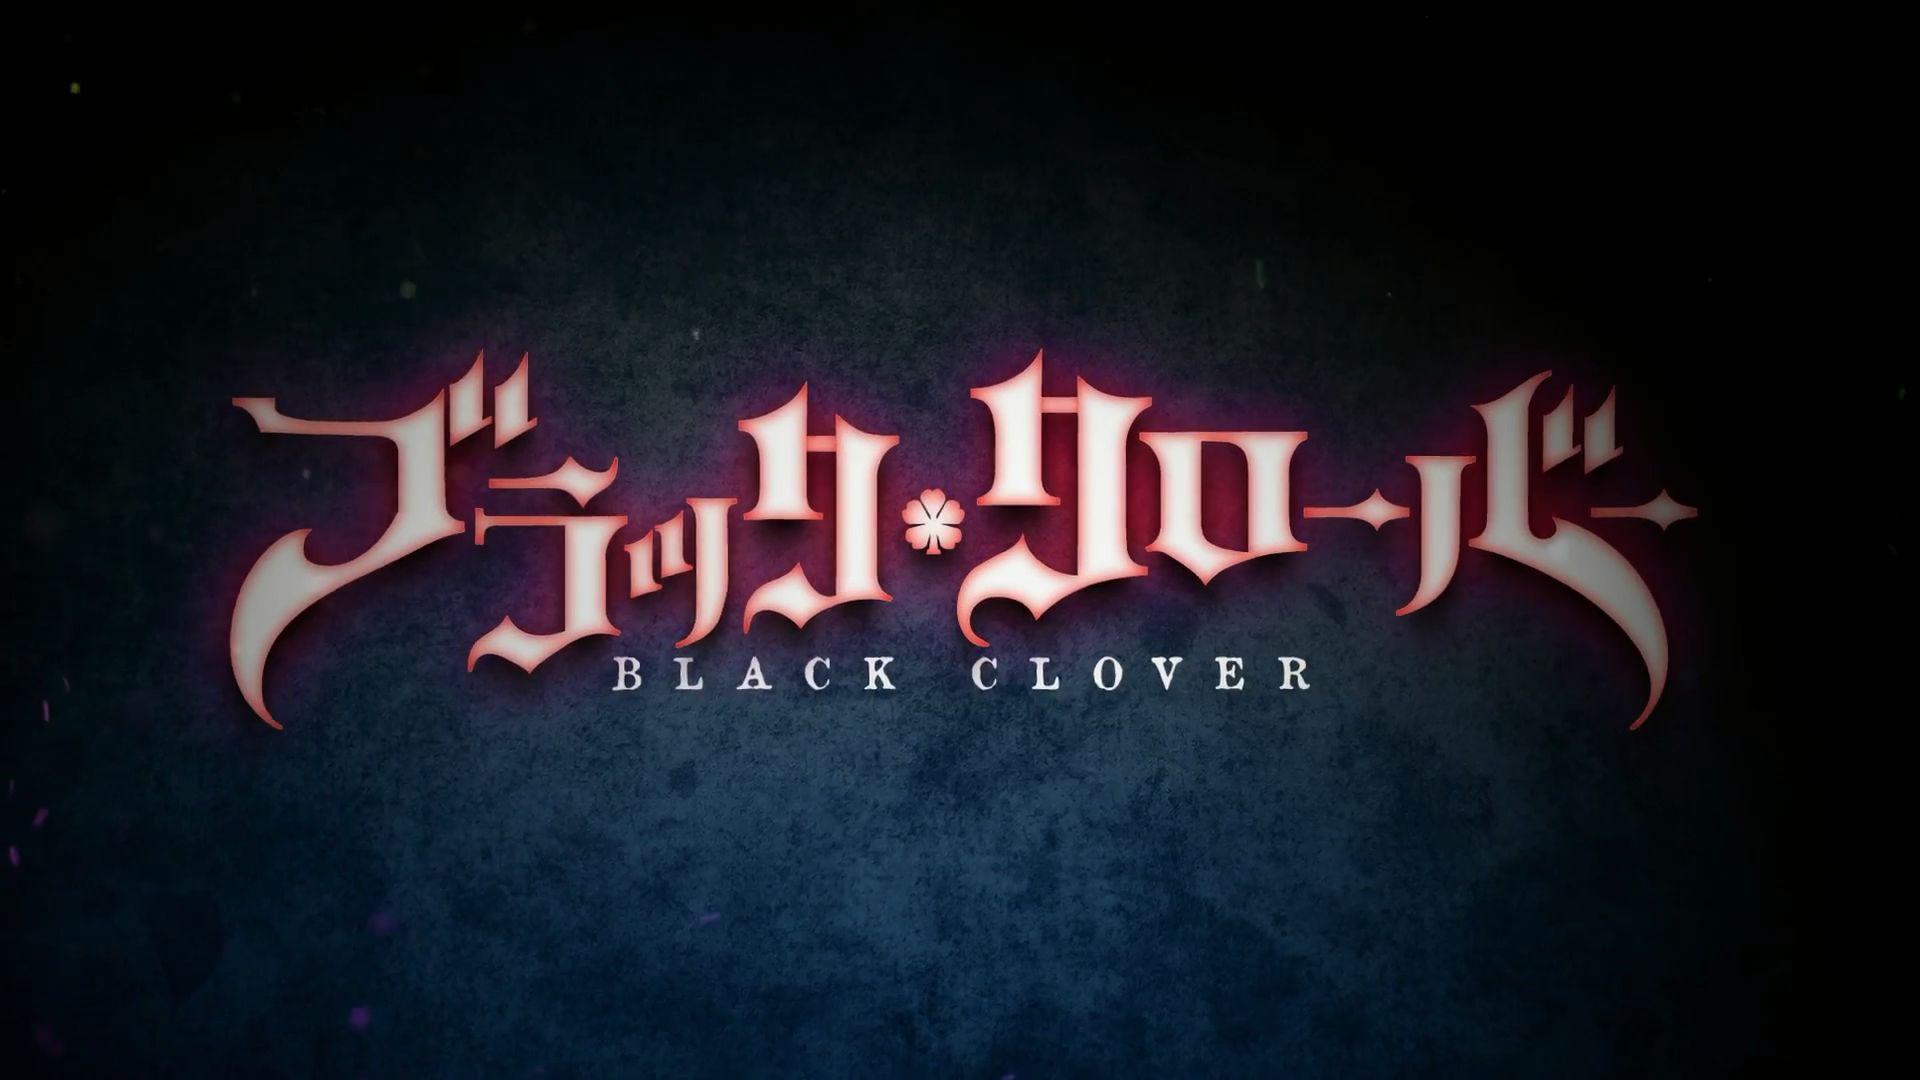 Black Clover Screen Saver